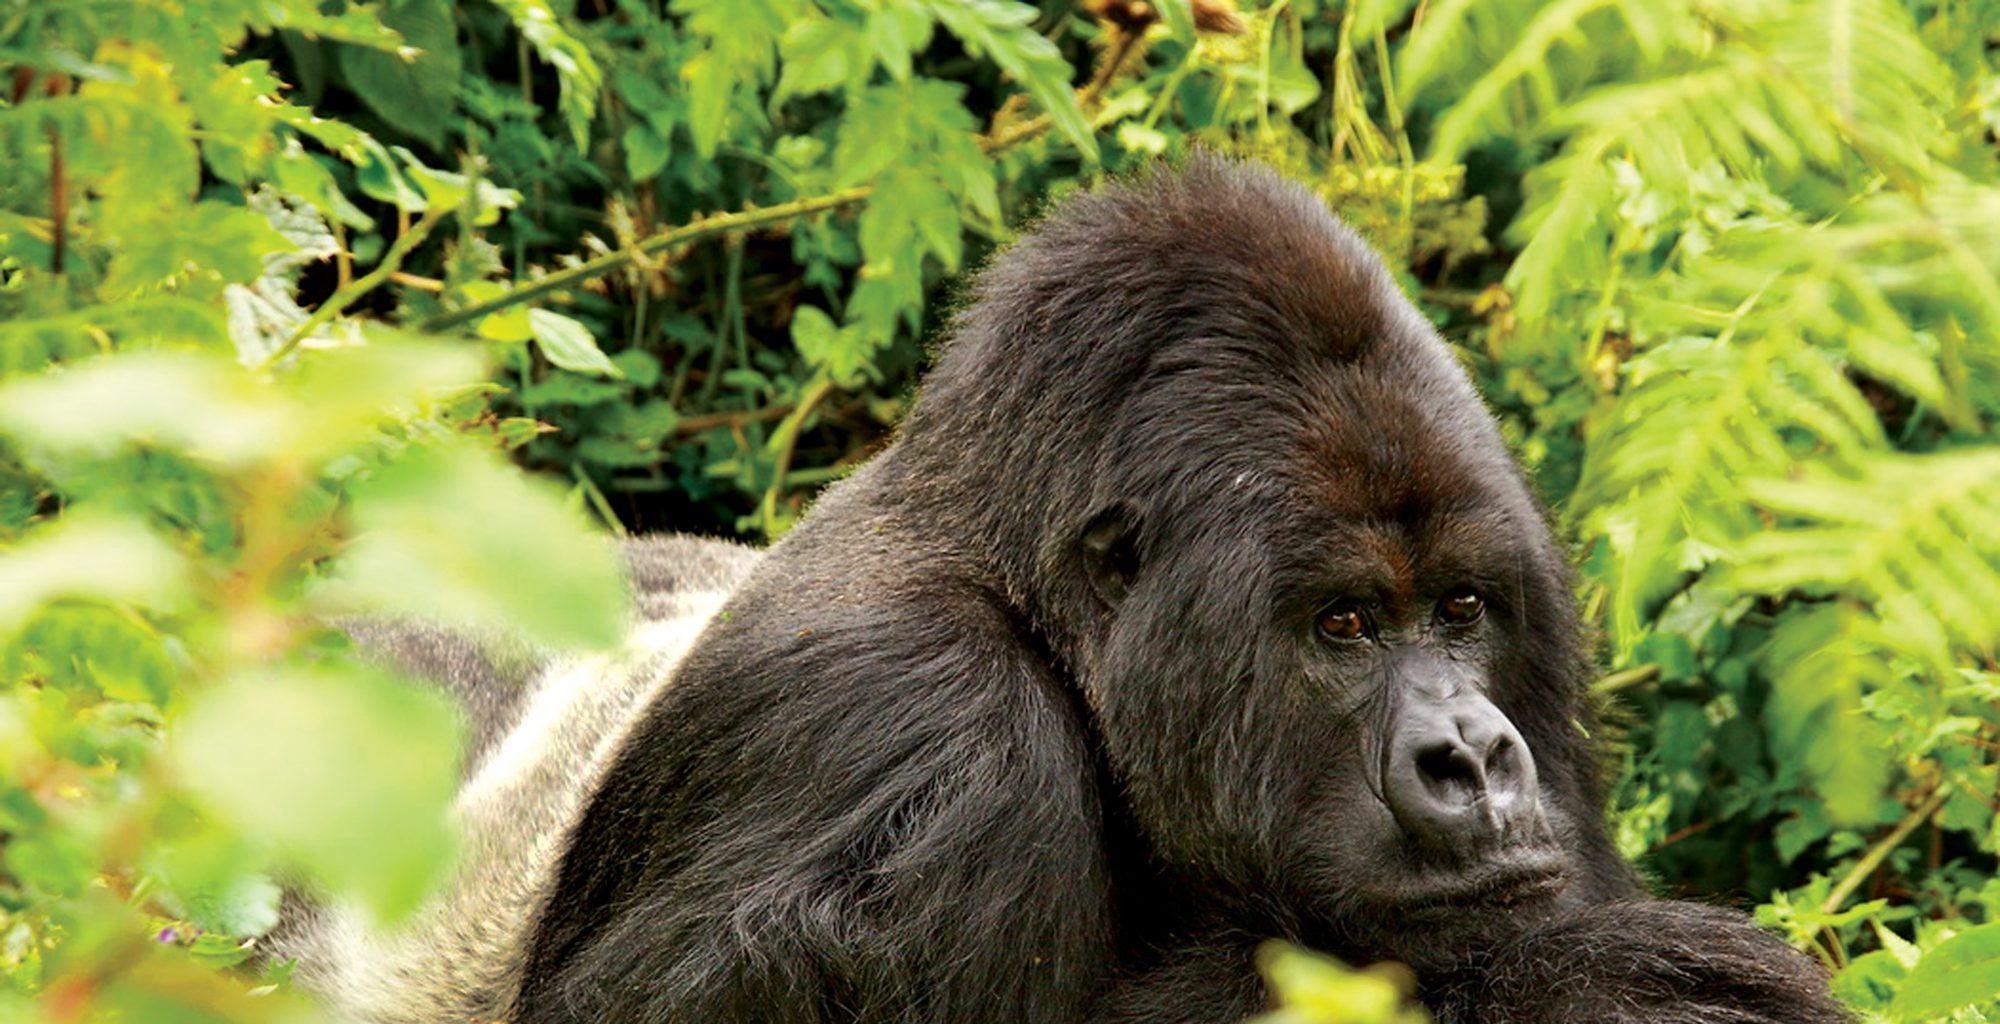 Rwanda-Volcanoes-National-Park-Gorilla